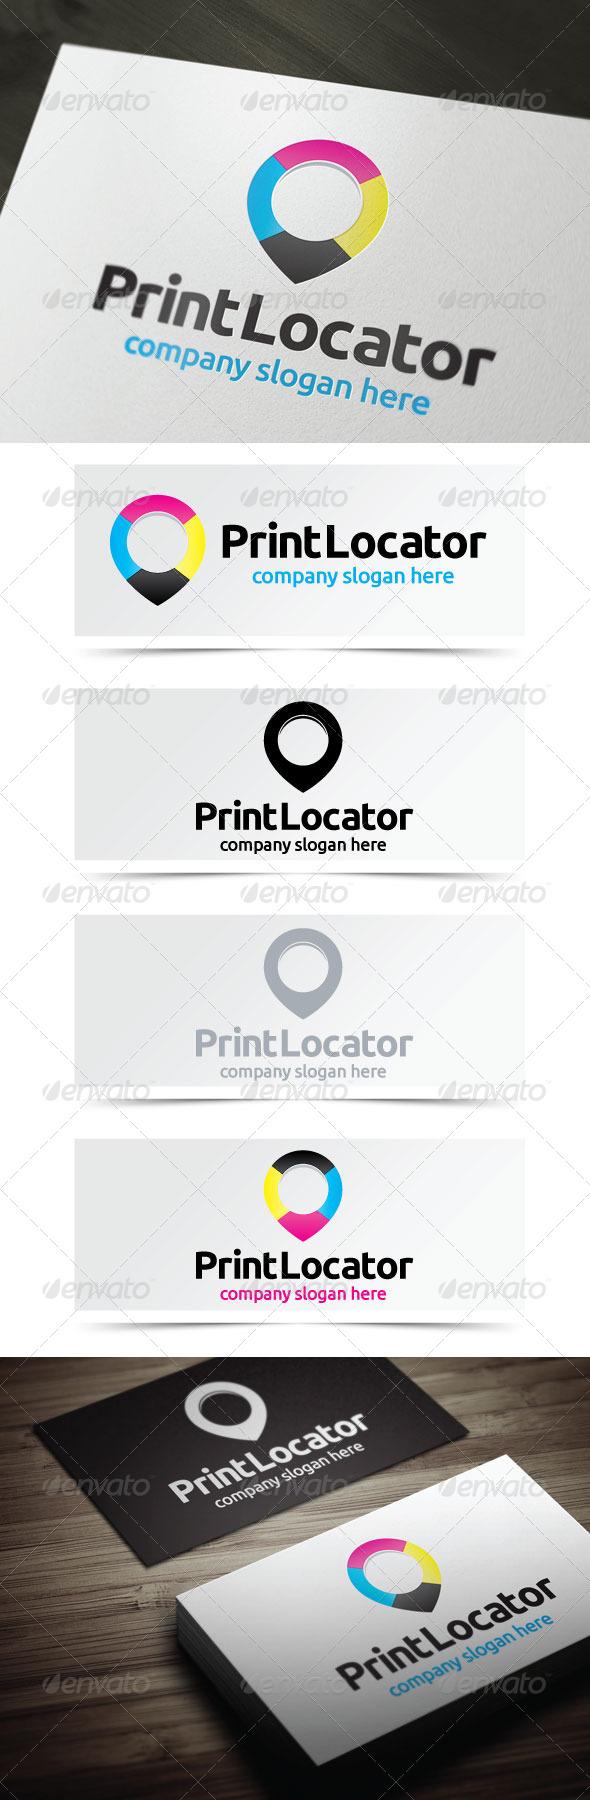 GraphicRiver Print Locator 4799201